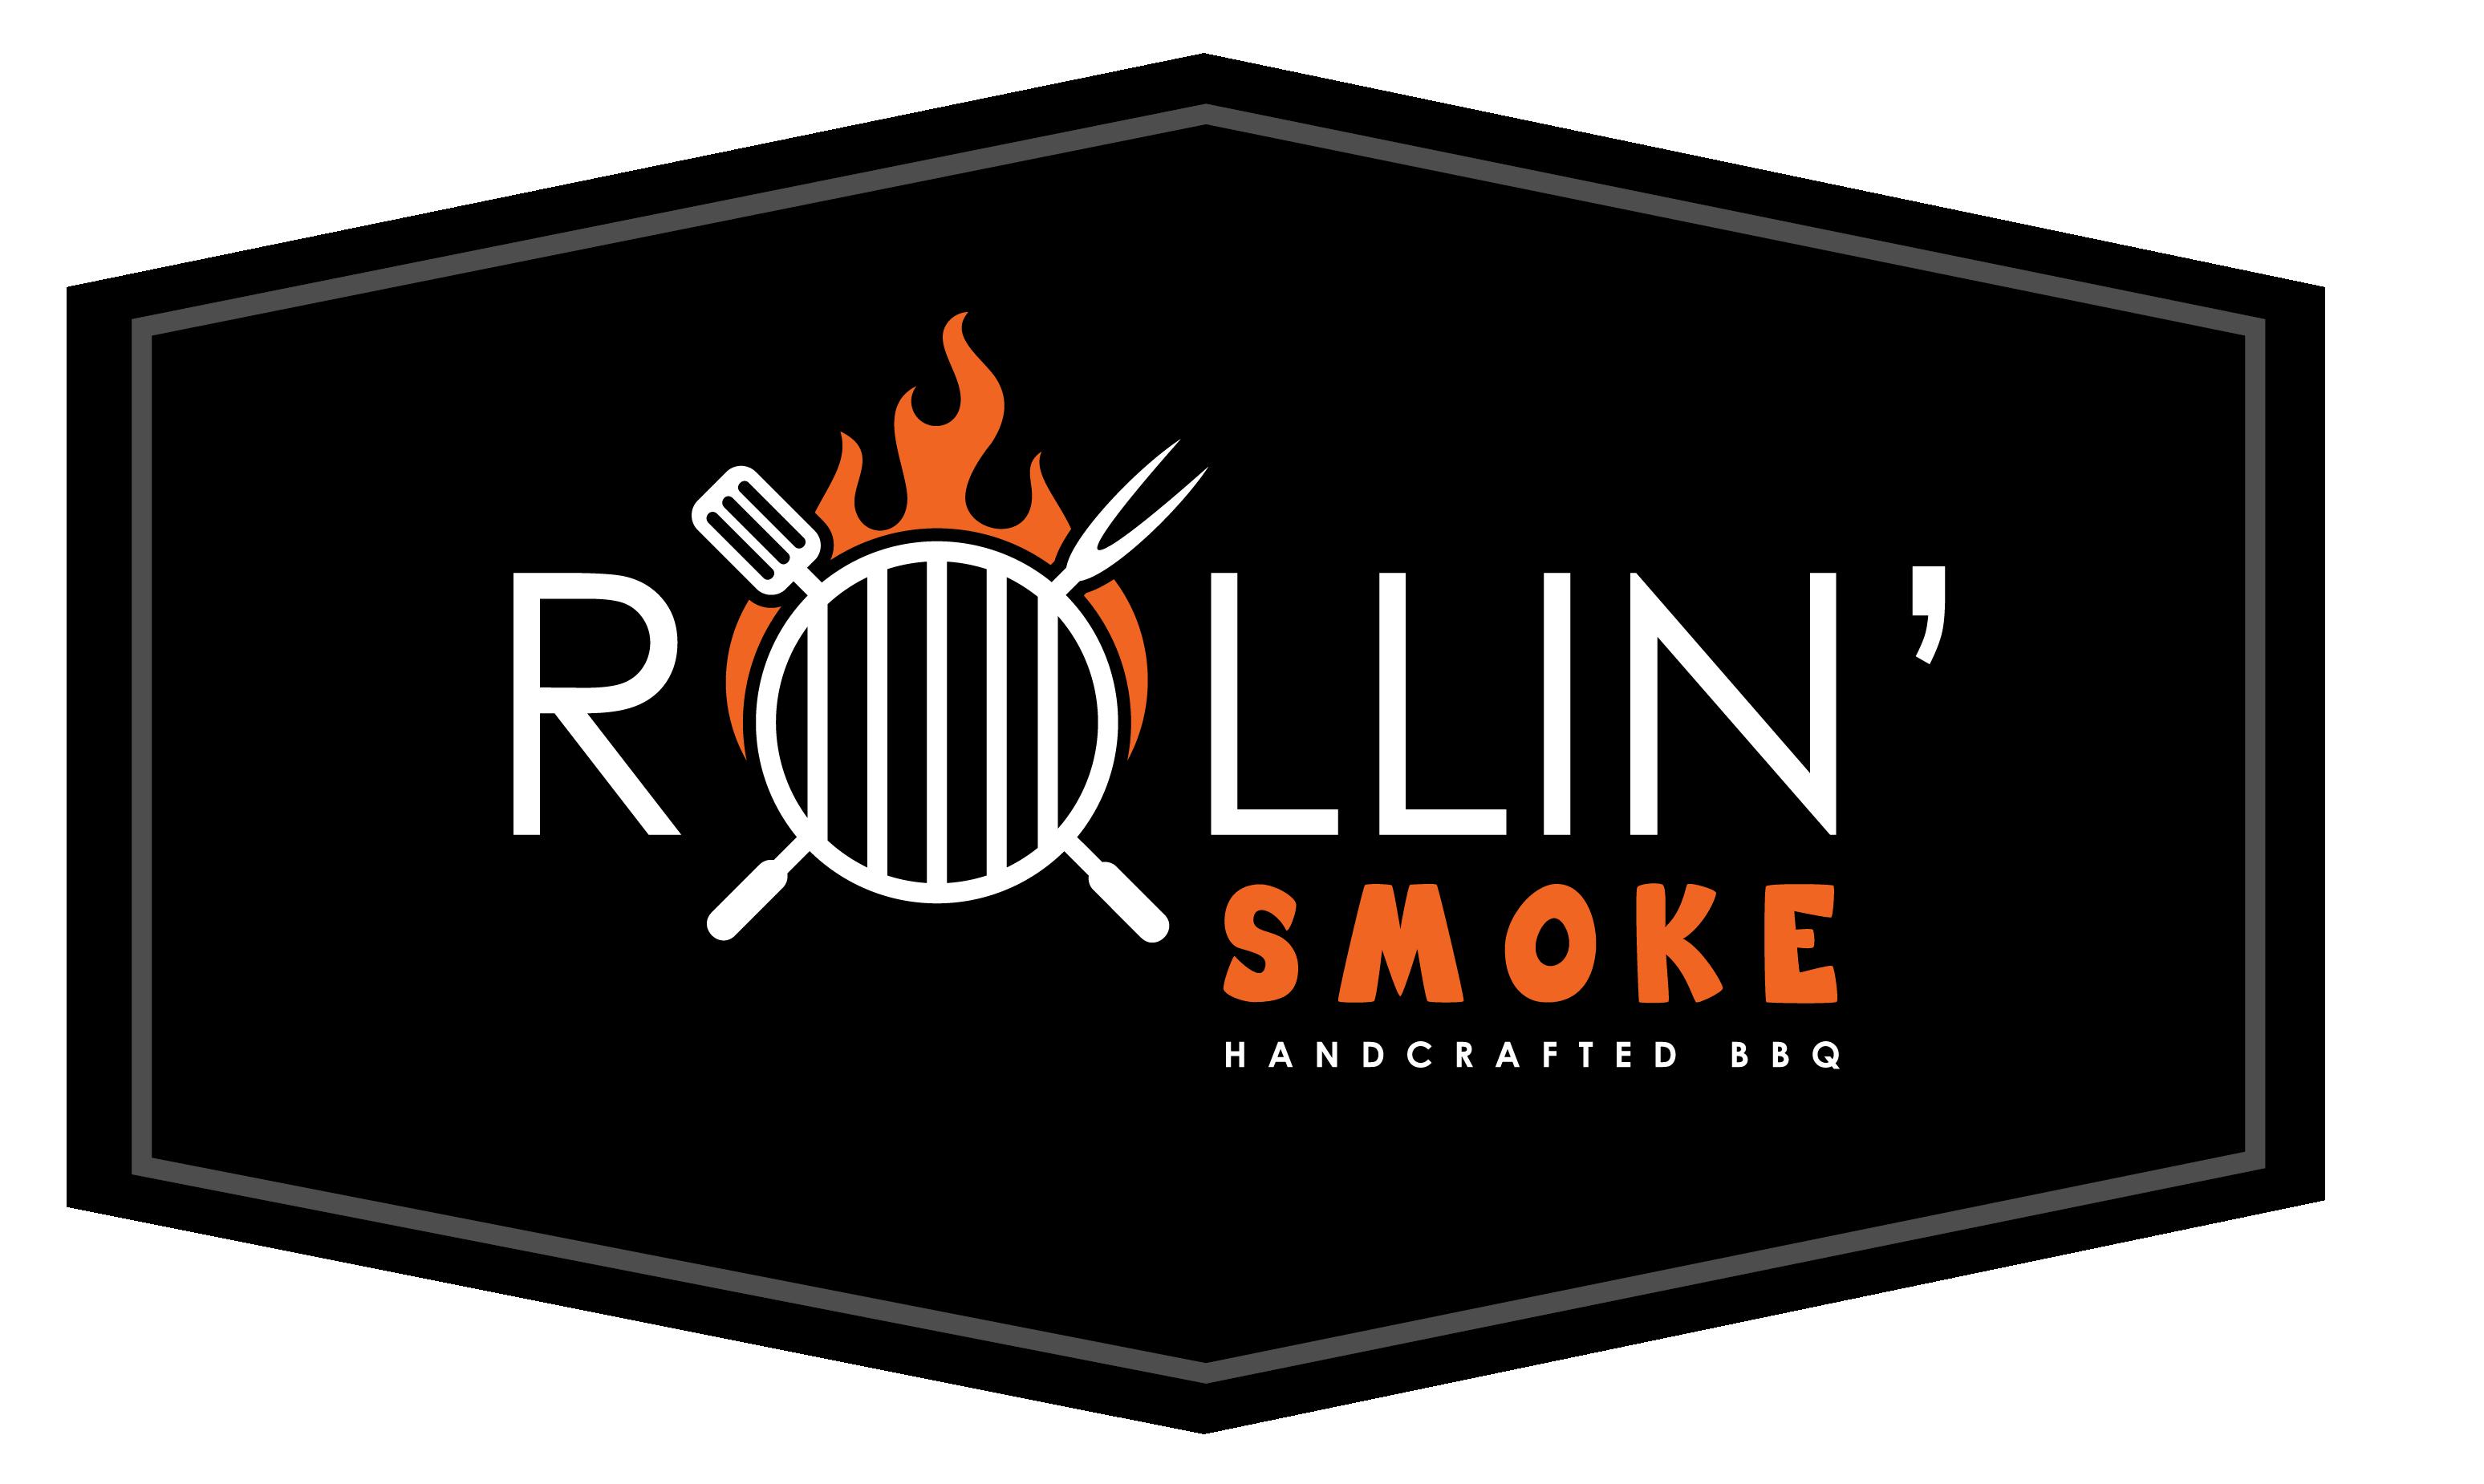 Rollin' Smoke Handcrafted BBQ